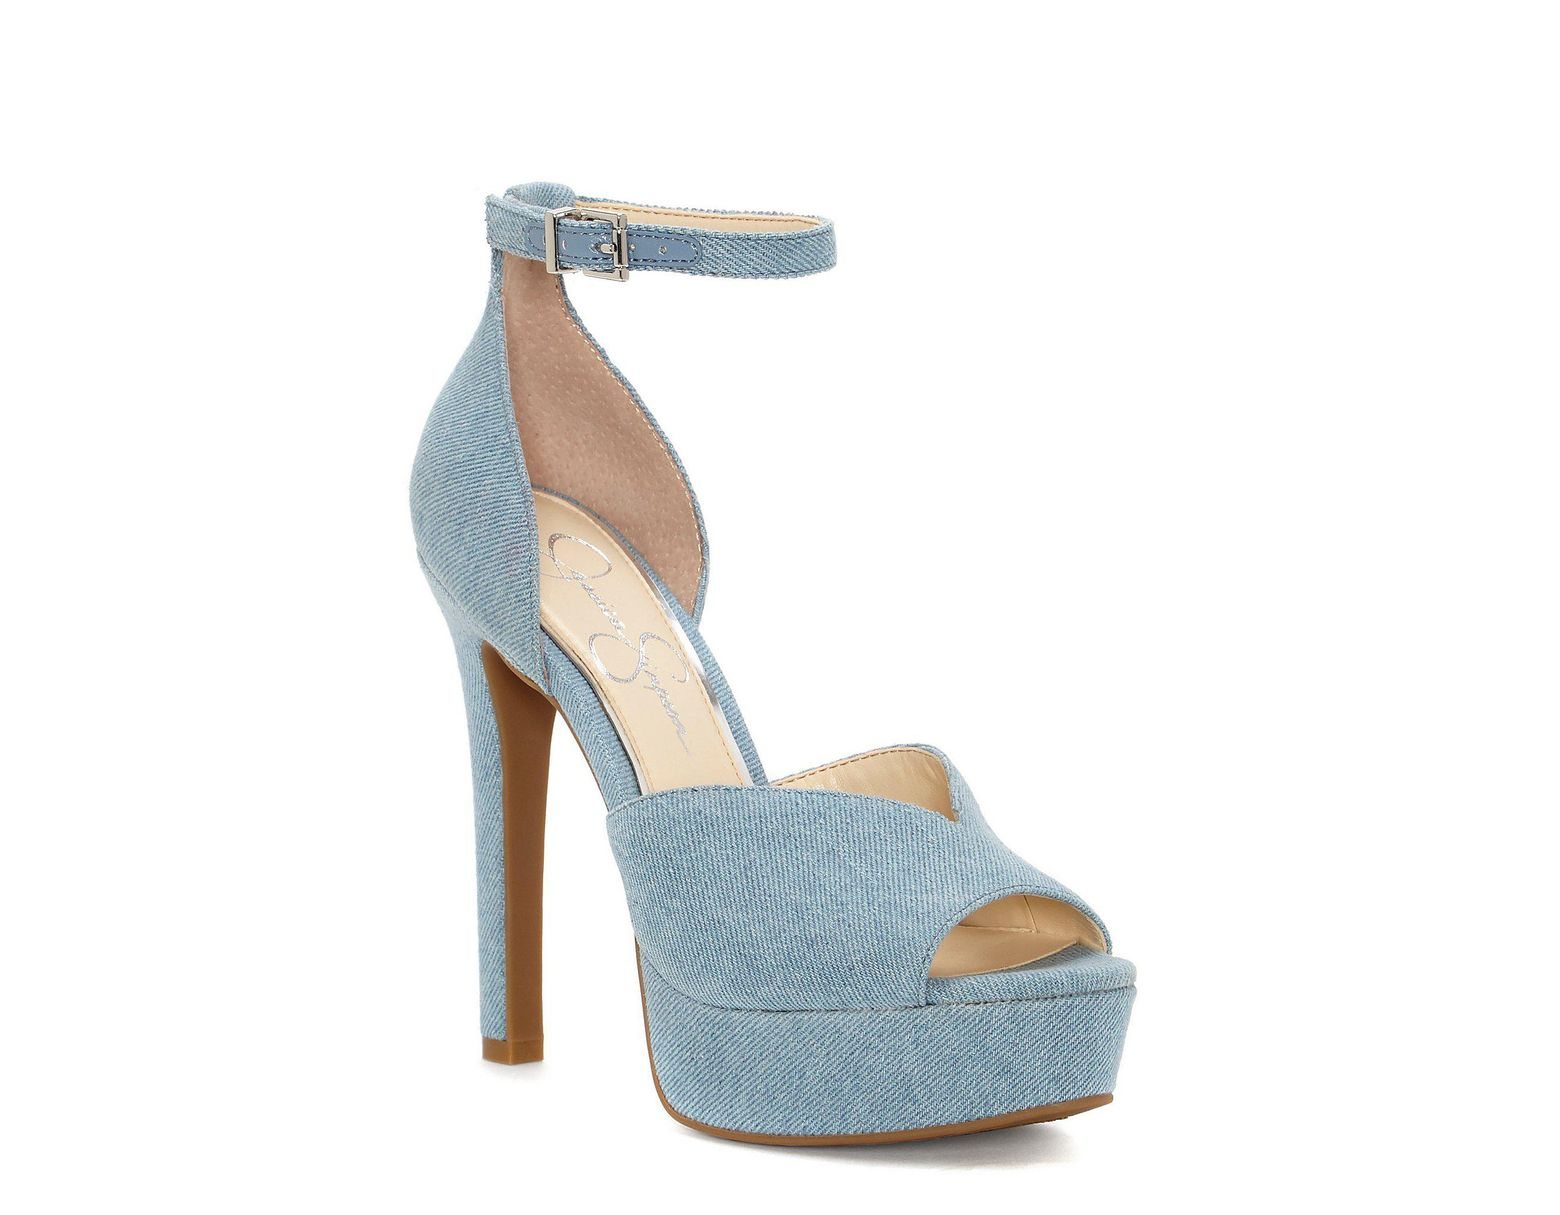 6e026e69bf95 Jessica Simpson Briya Denim Peep Toe Platform With Ankle Strap Pumps in  Blue - Lyst